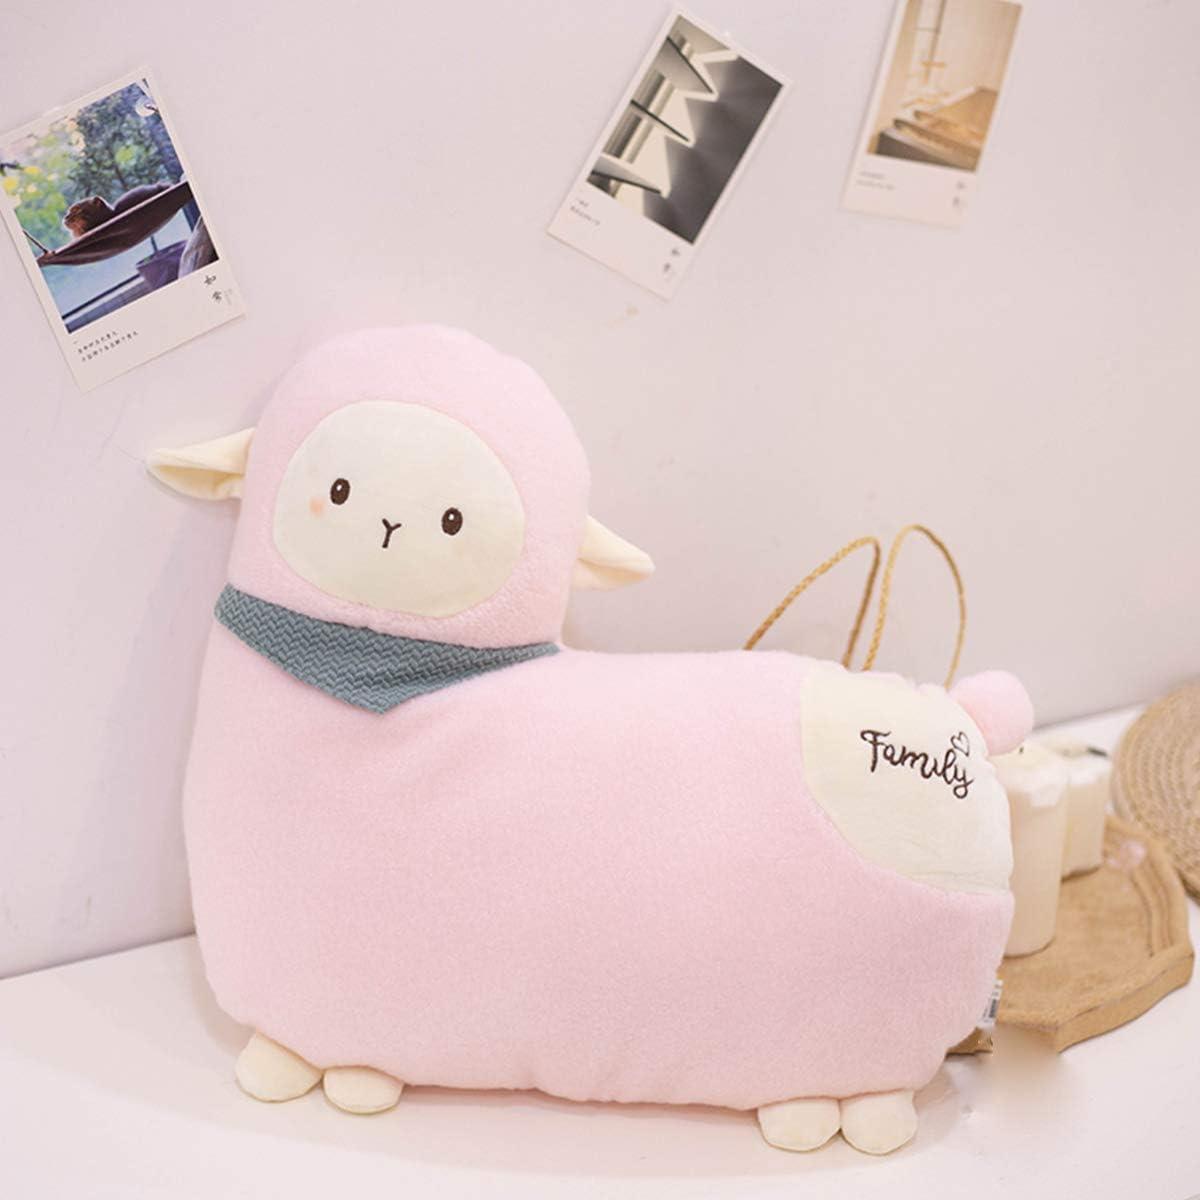 Valentine Super Soft Alpaca Plush Hugging Pillow Cute Llama Stuffed Animal Toy Kids Gifts for Birthday Christmas